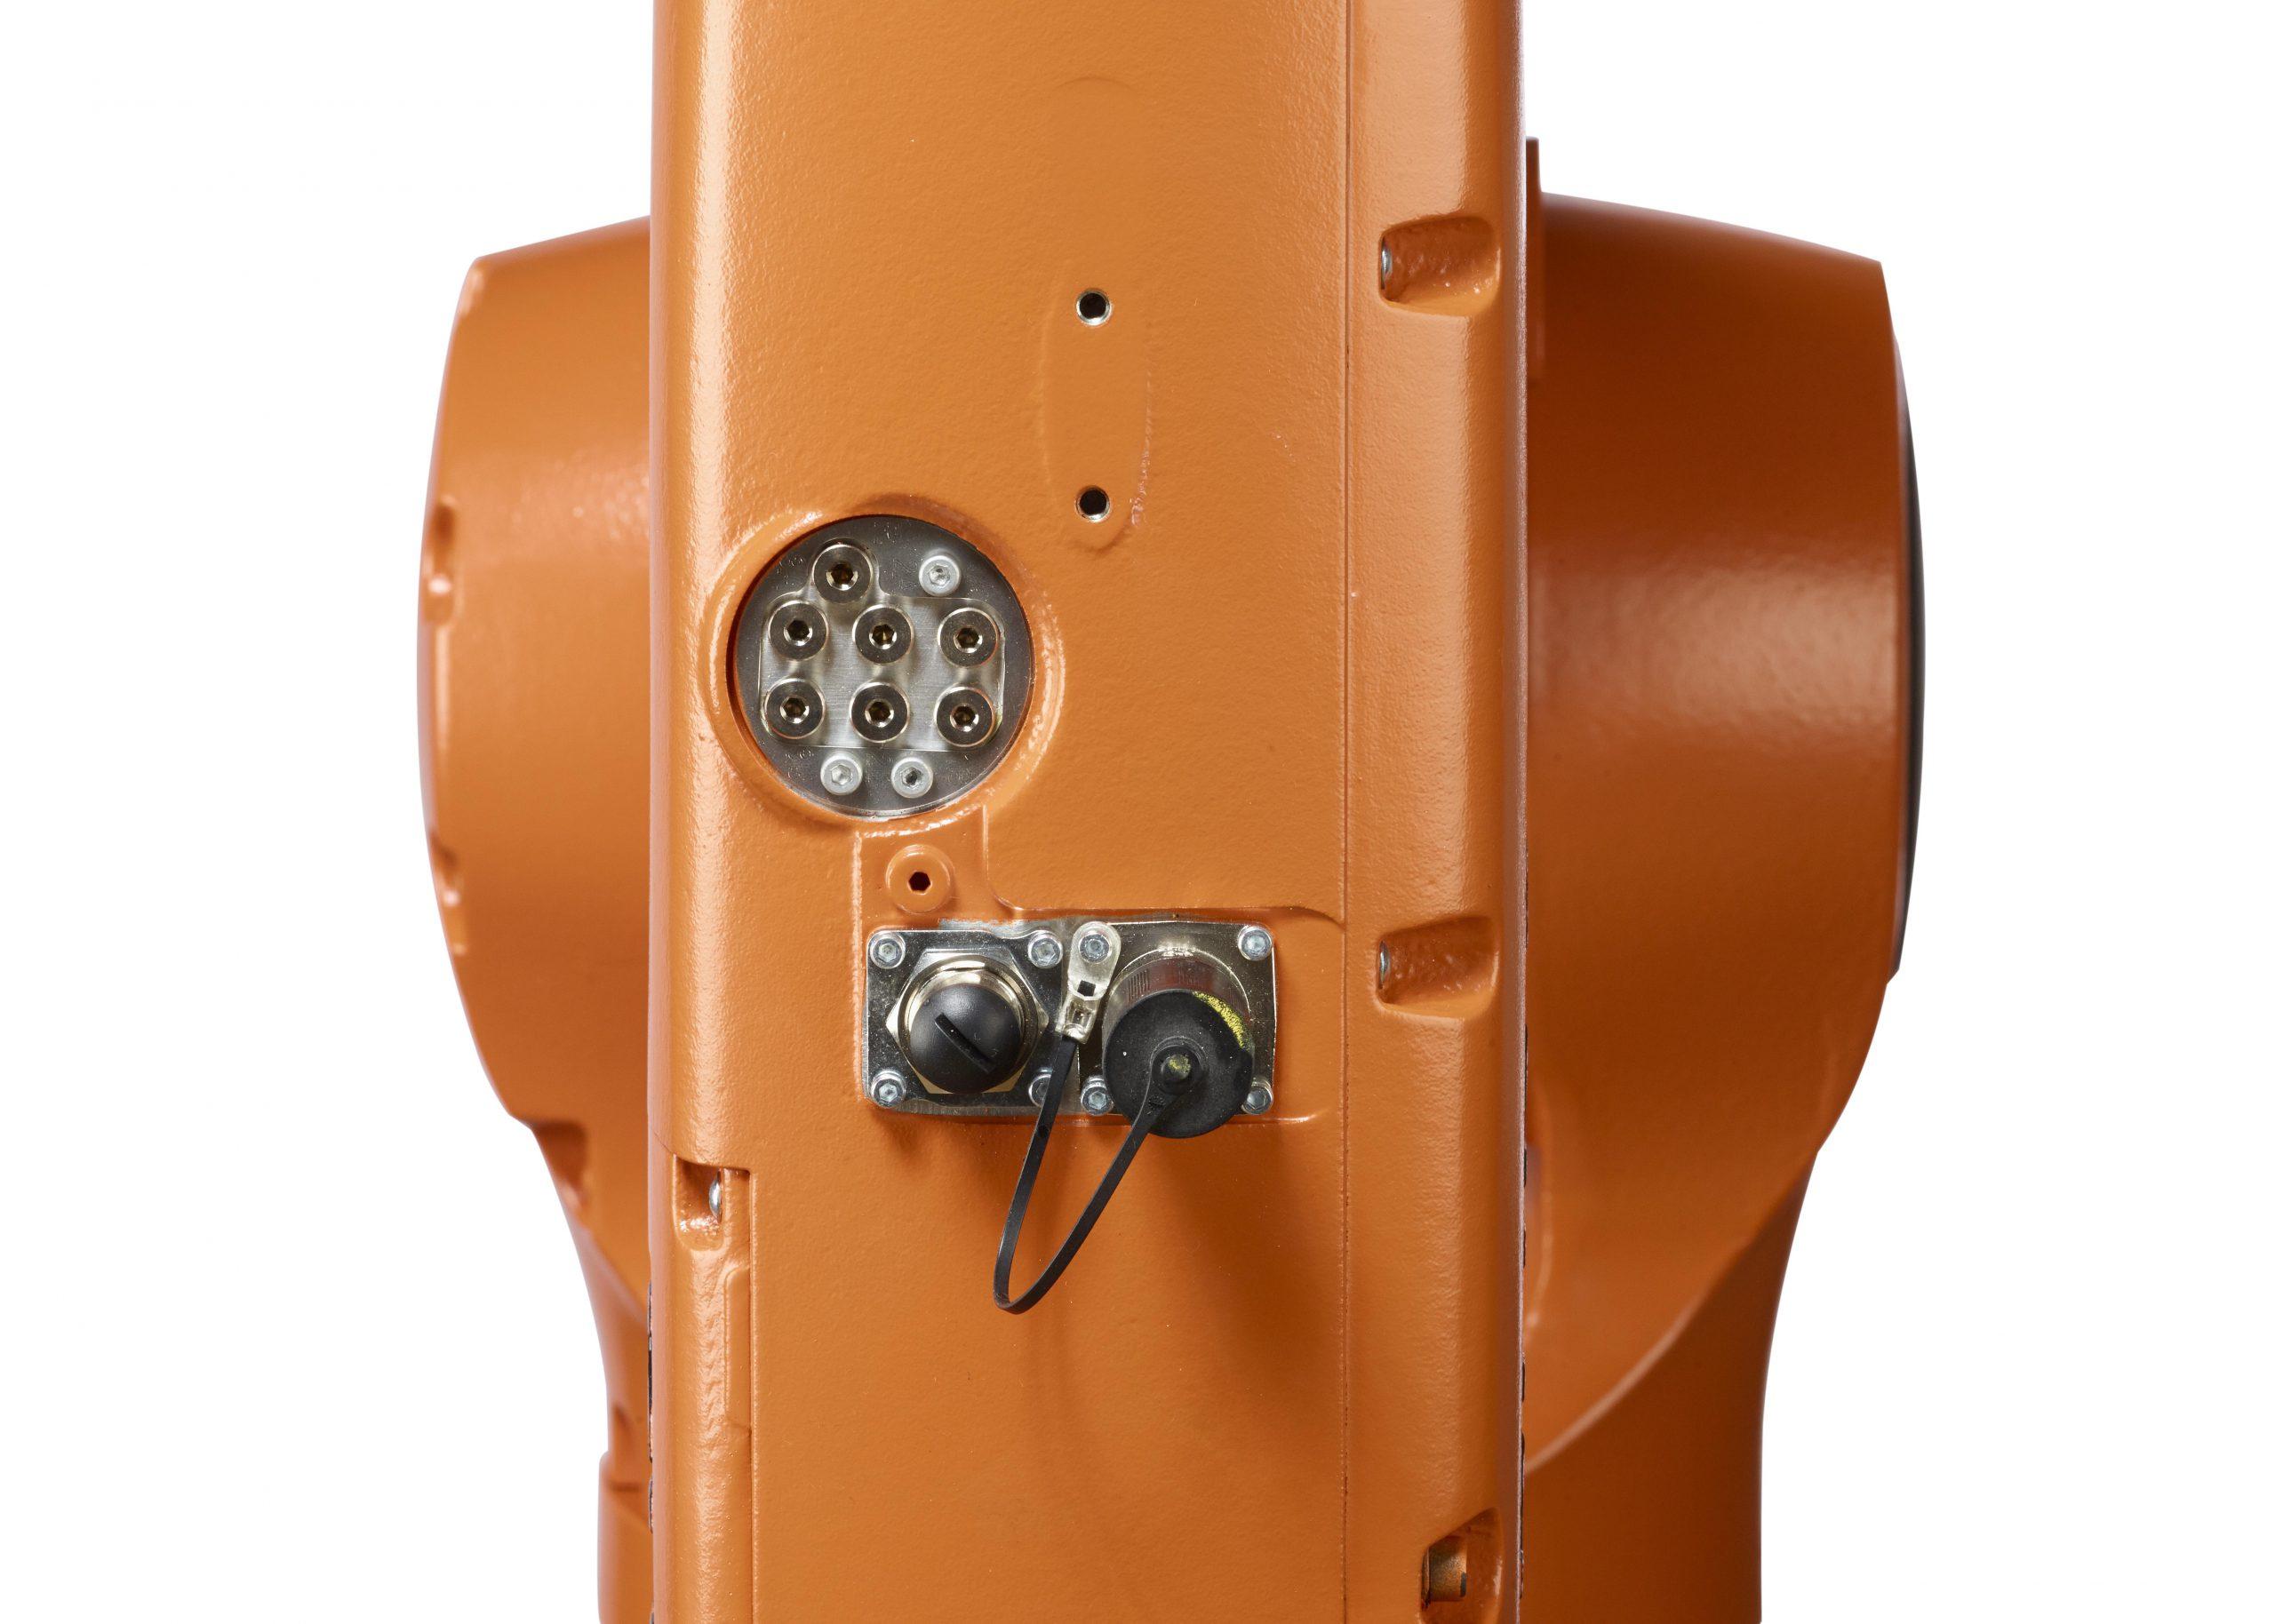 KUKA KR 6 R700 sixx WP (KR AGILUS)-9